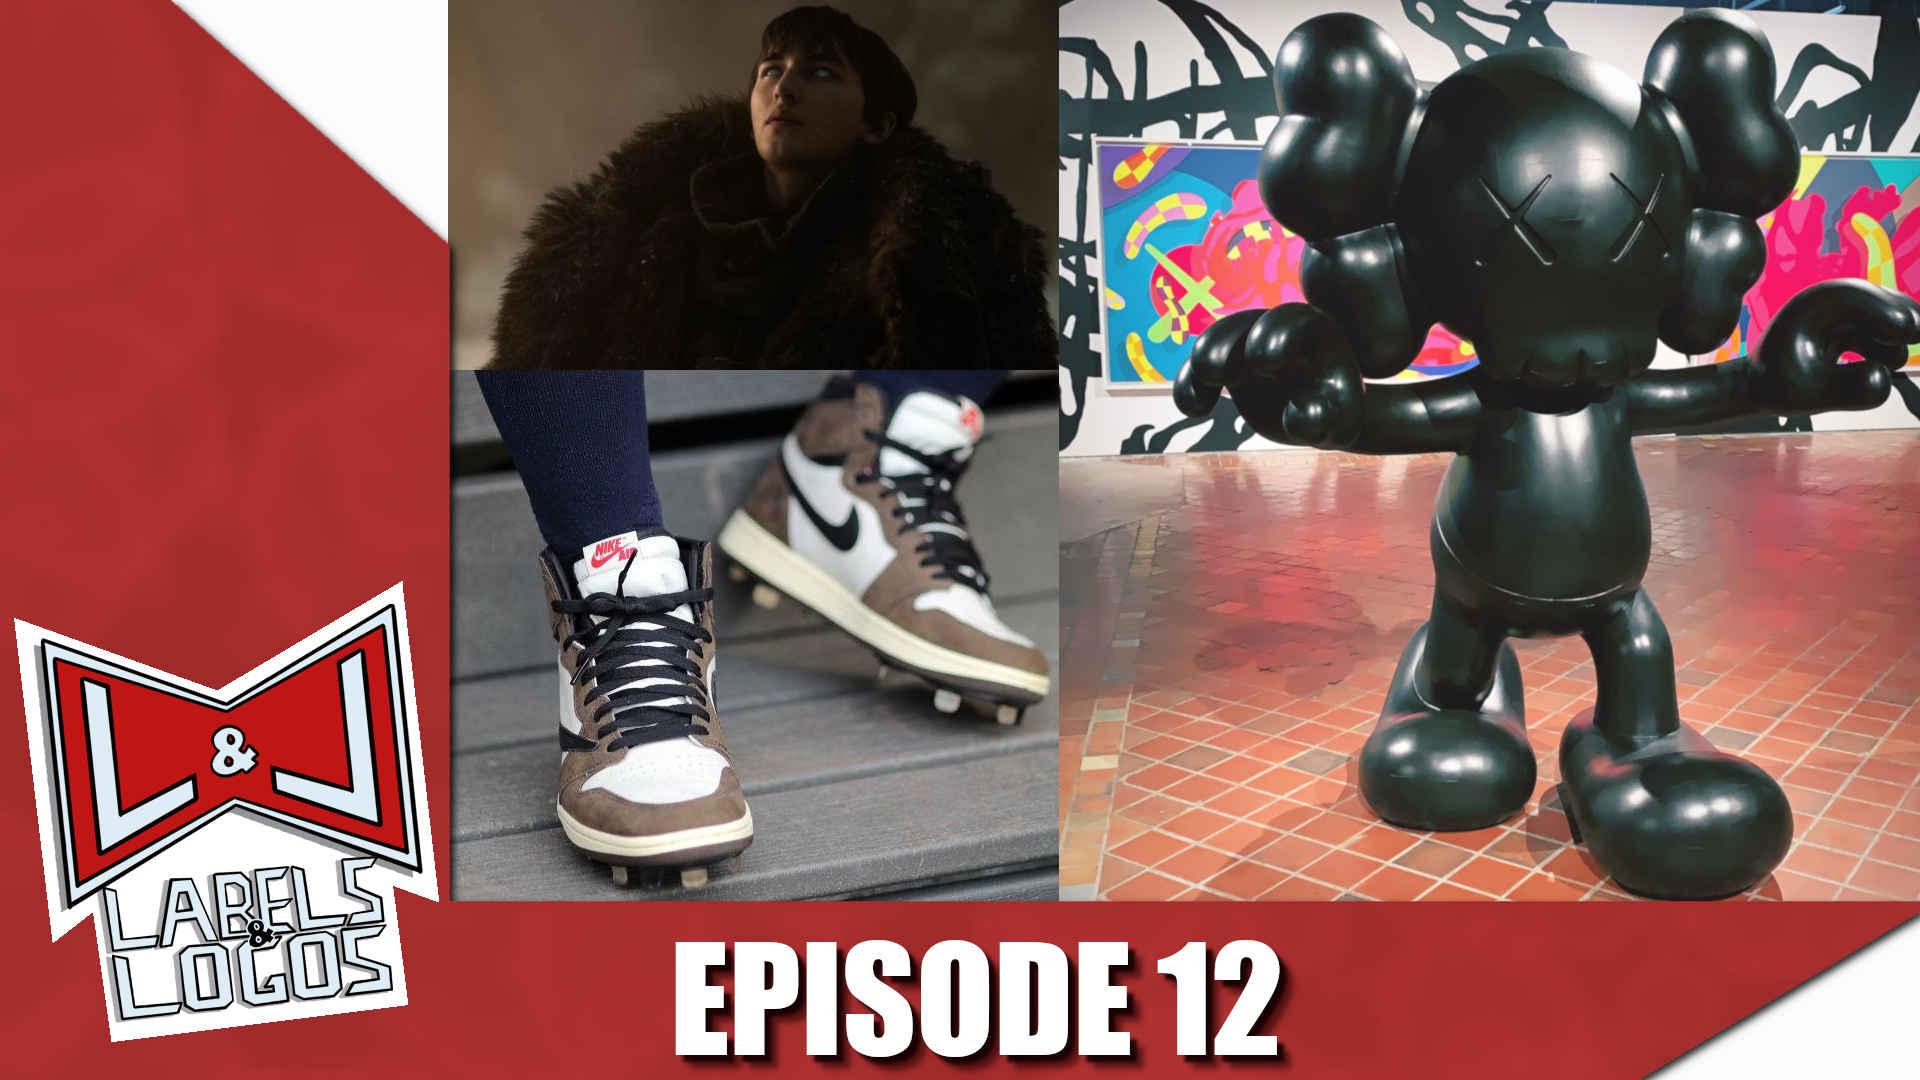 Labels & Logos - Episode 12